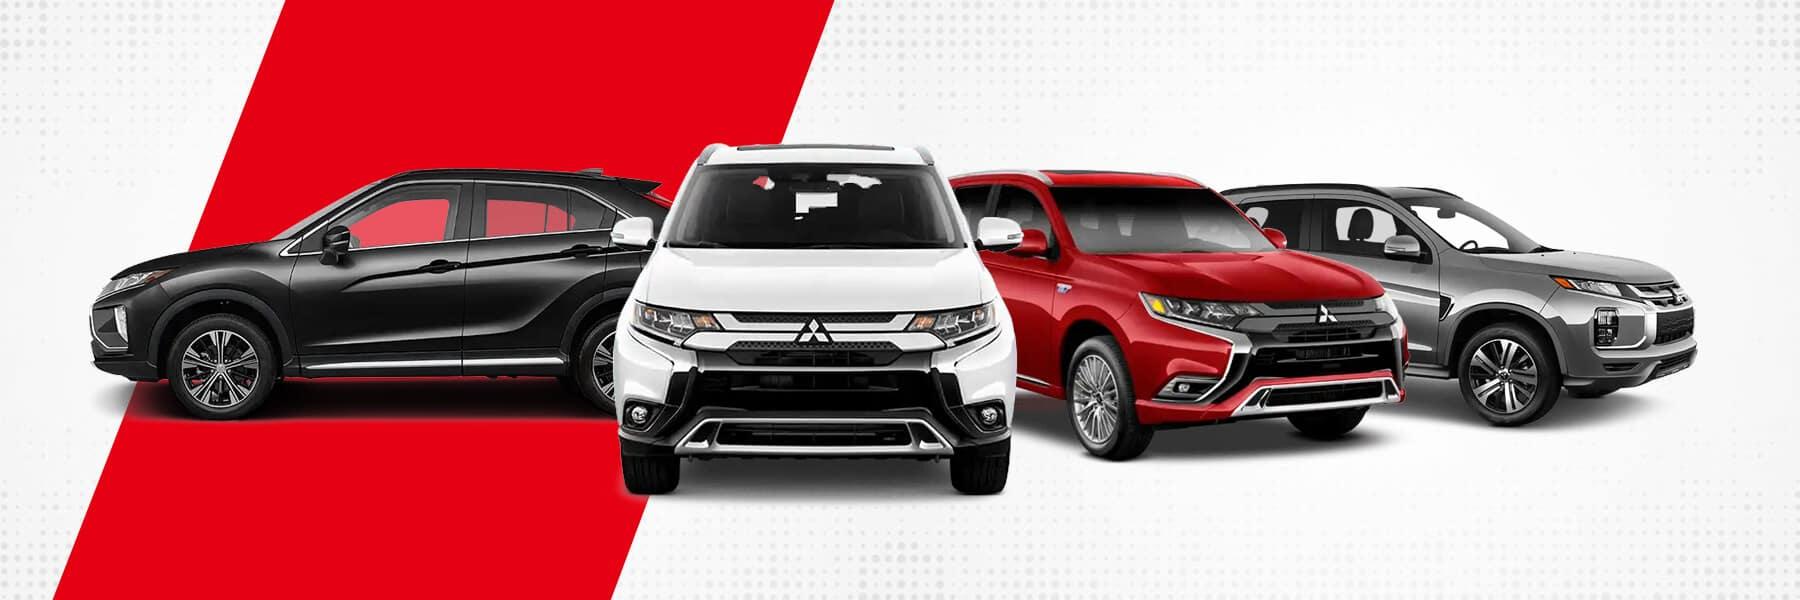 Mitsubishi SUV and Crossover Lineup